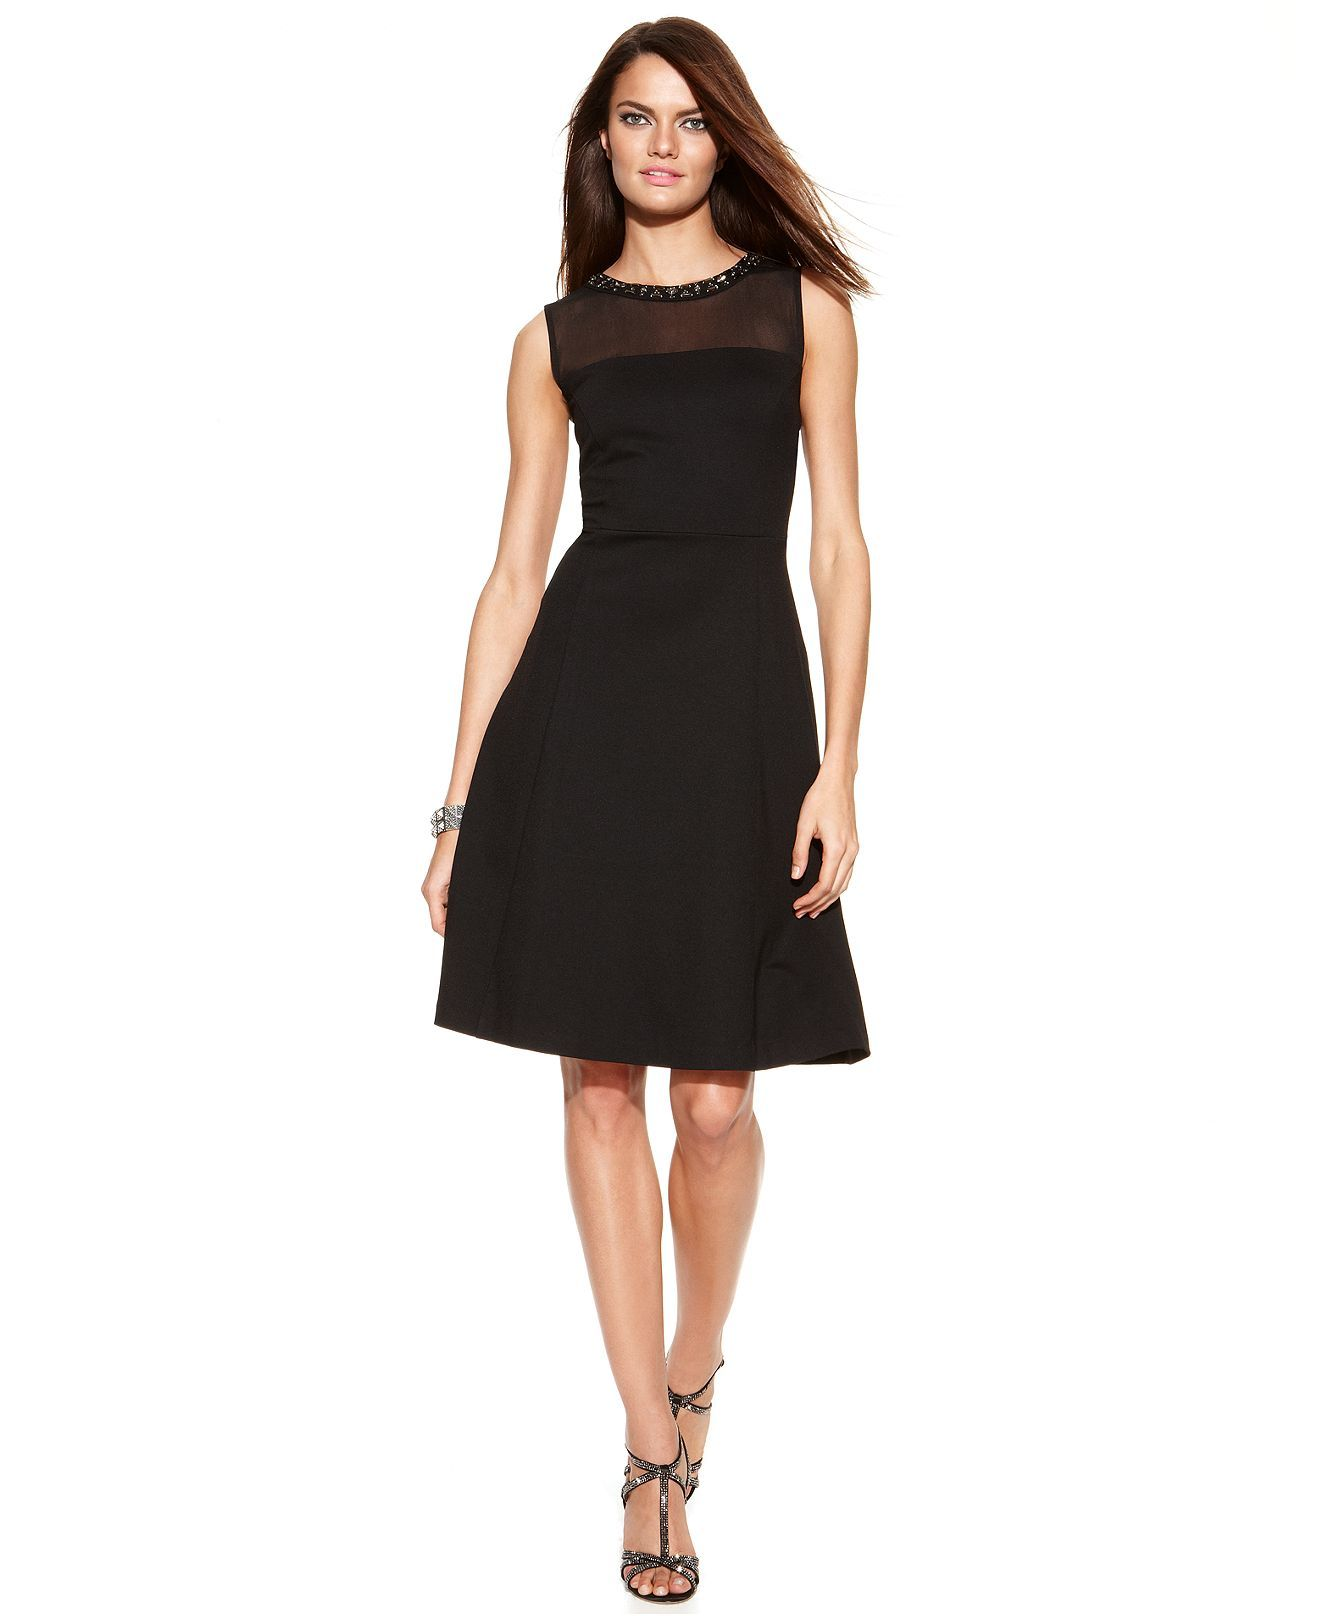 2ac27868d0e INC International Concepts Embellished Sleeveless A-Line Dress - Dresses -  Women - Macy s